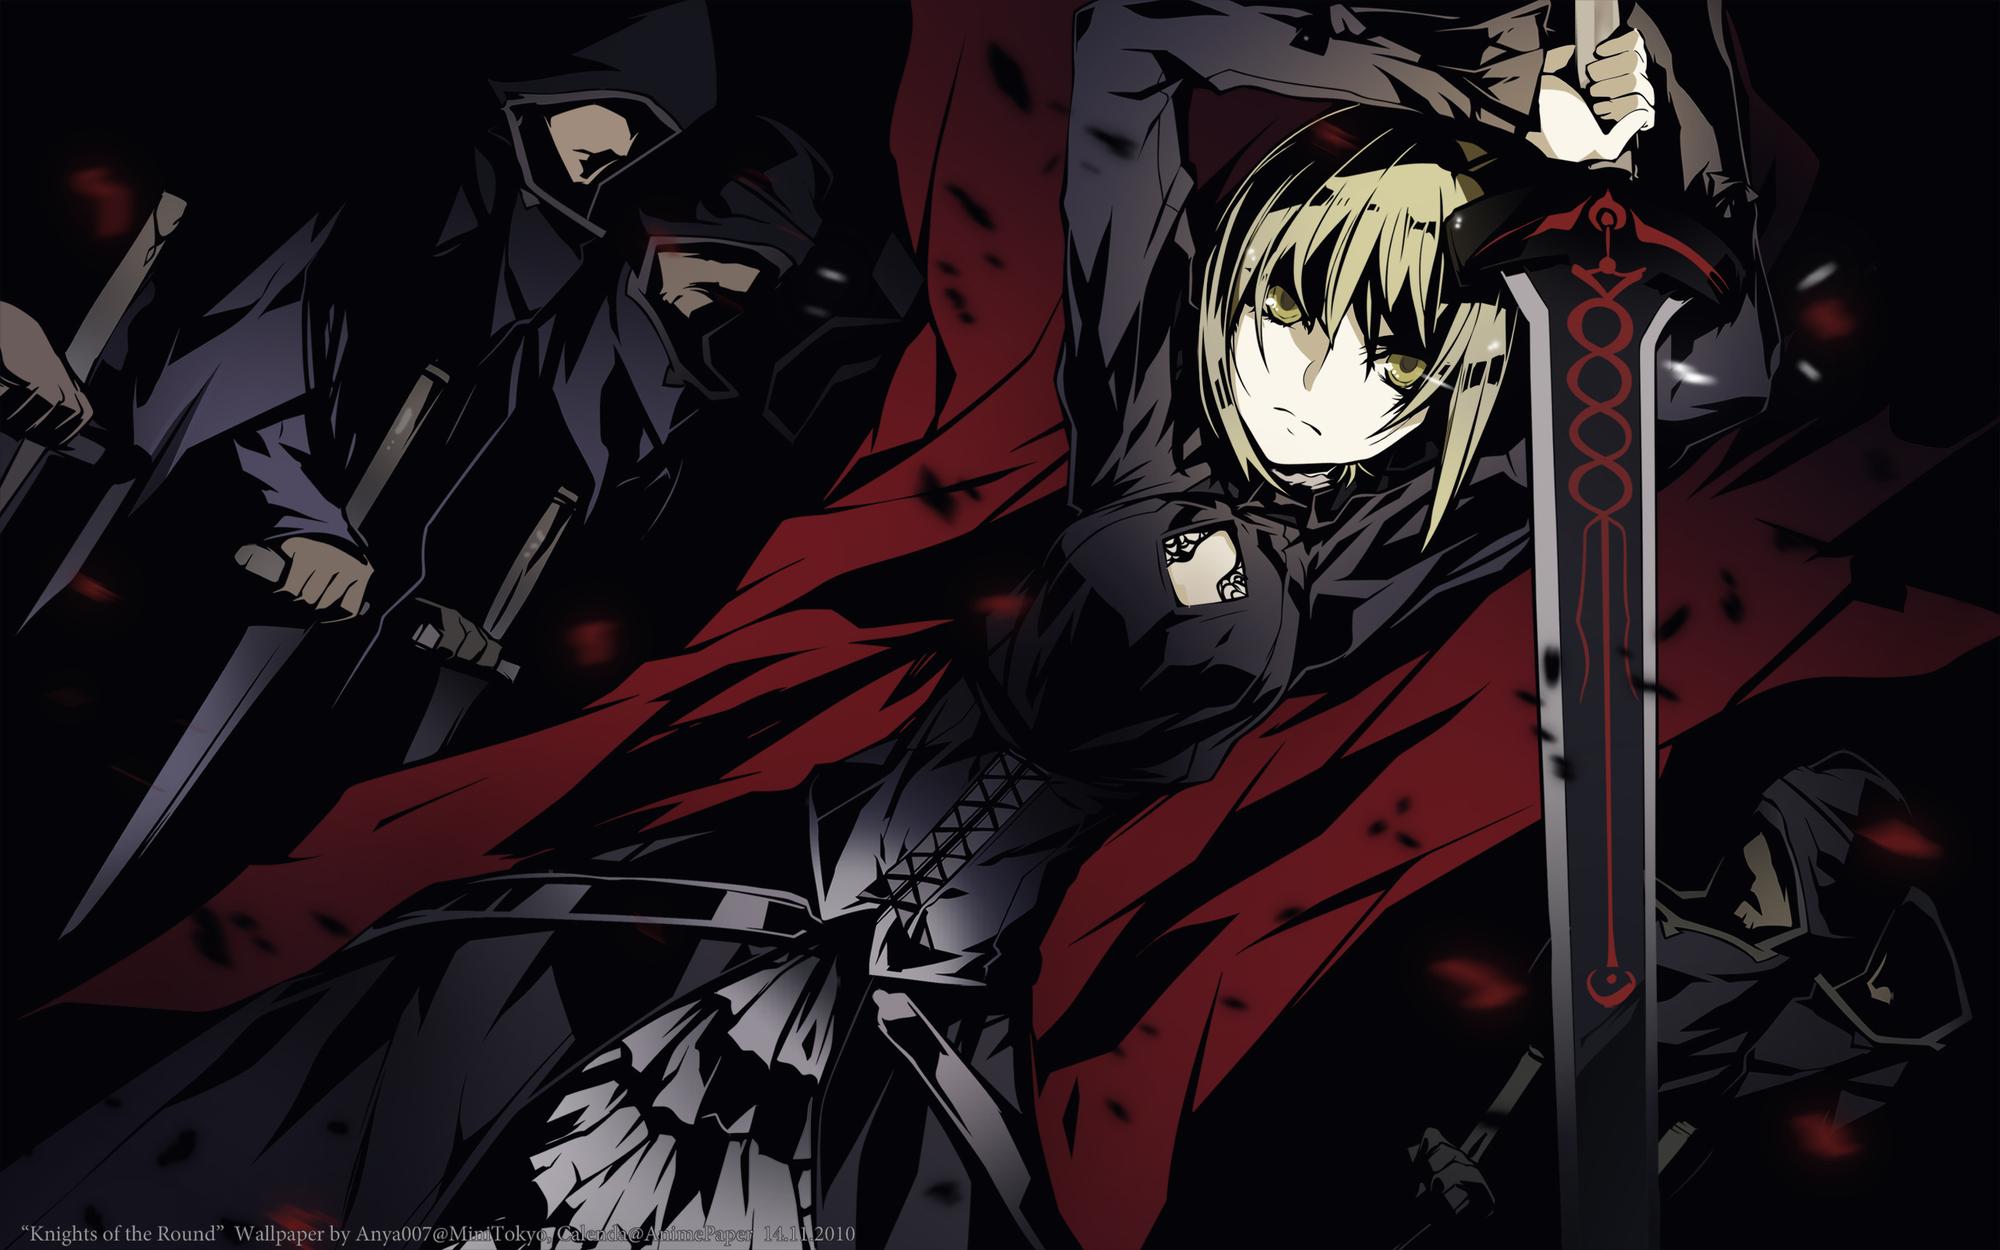 Dark Saber Fate Stay Night Wallpaper 24684693 Fanpop